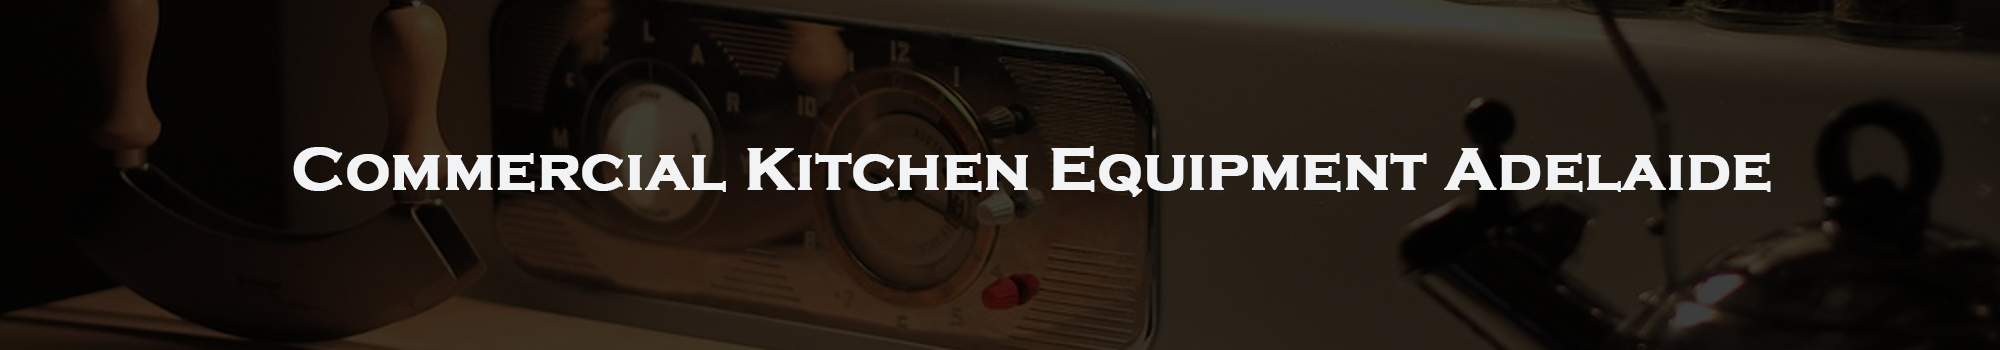 Commercial Kitchen Equipment Adelaide